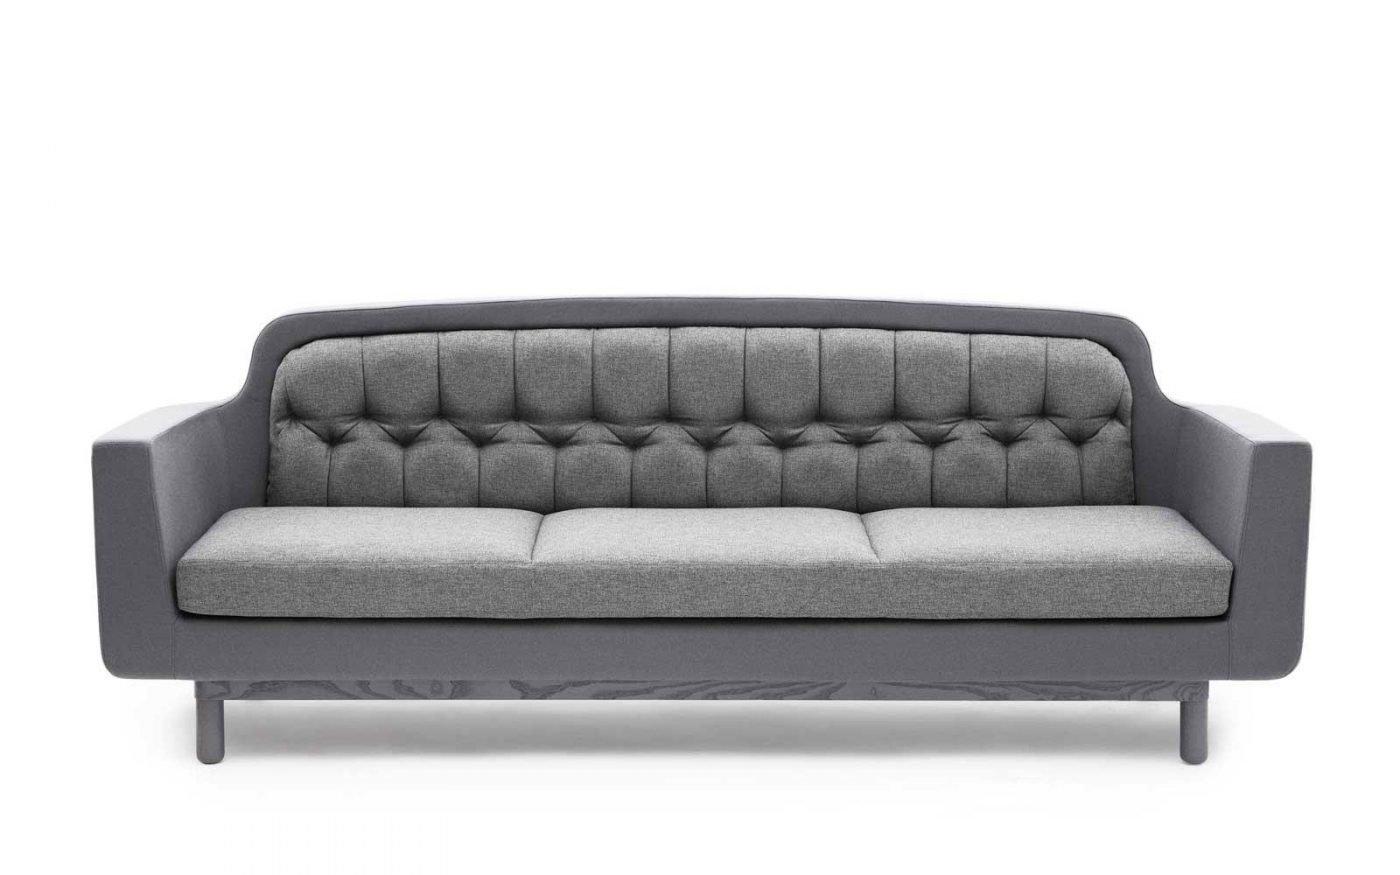 Onkel Sofa 3 Seater light grey normann copenhagen